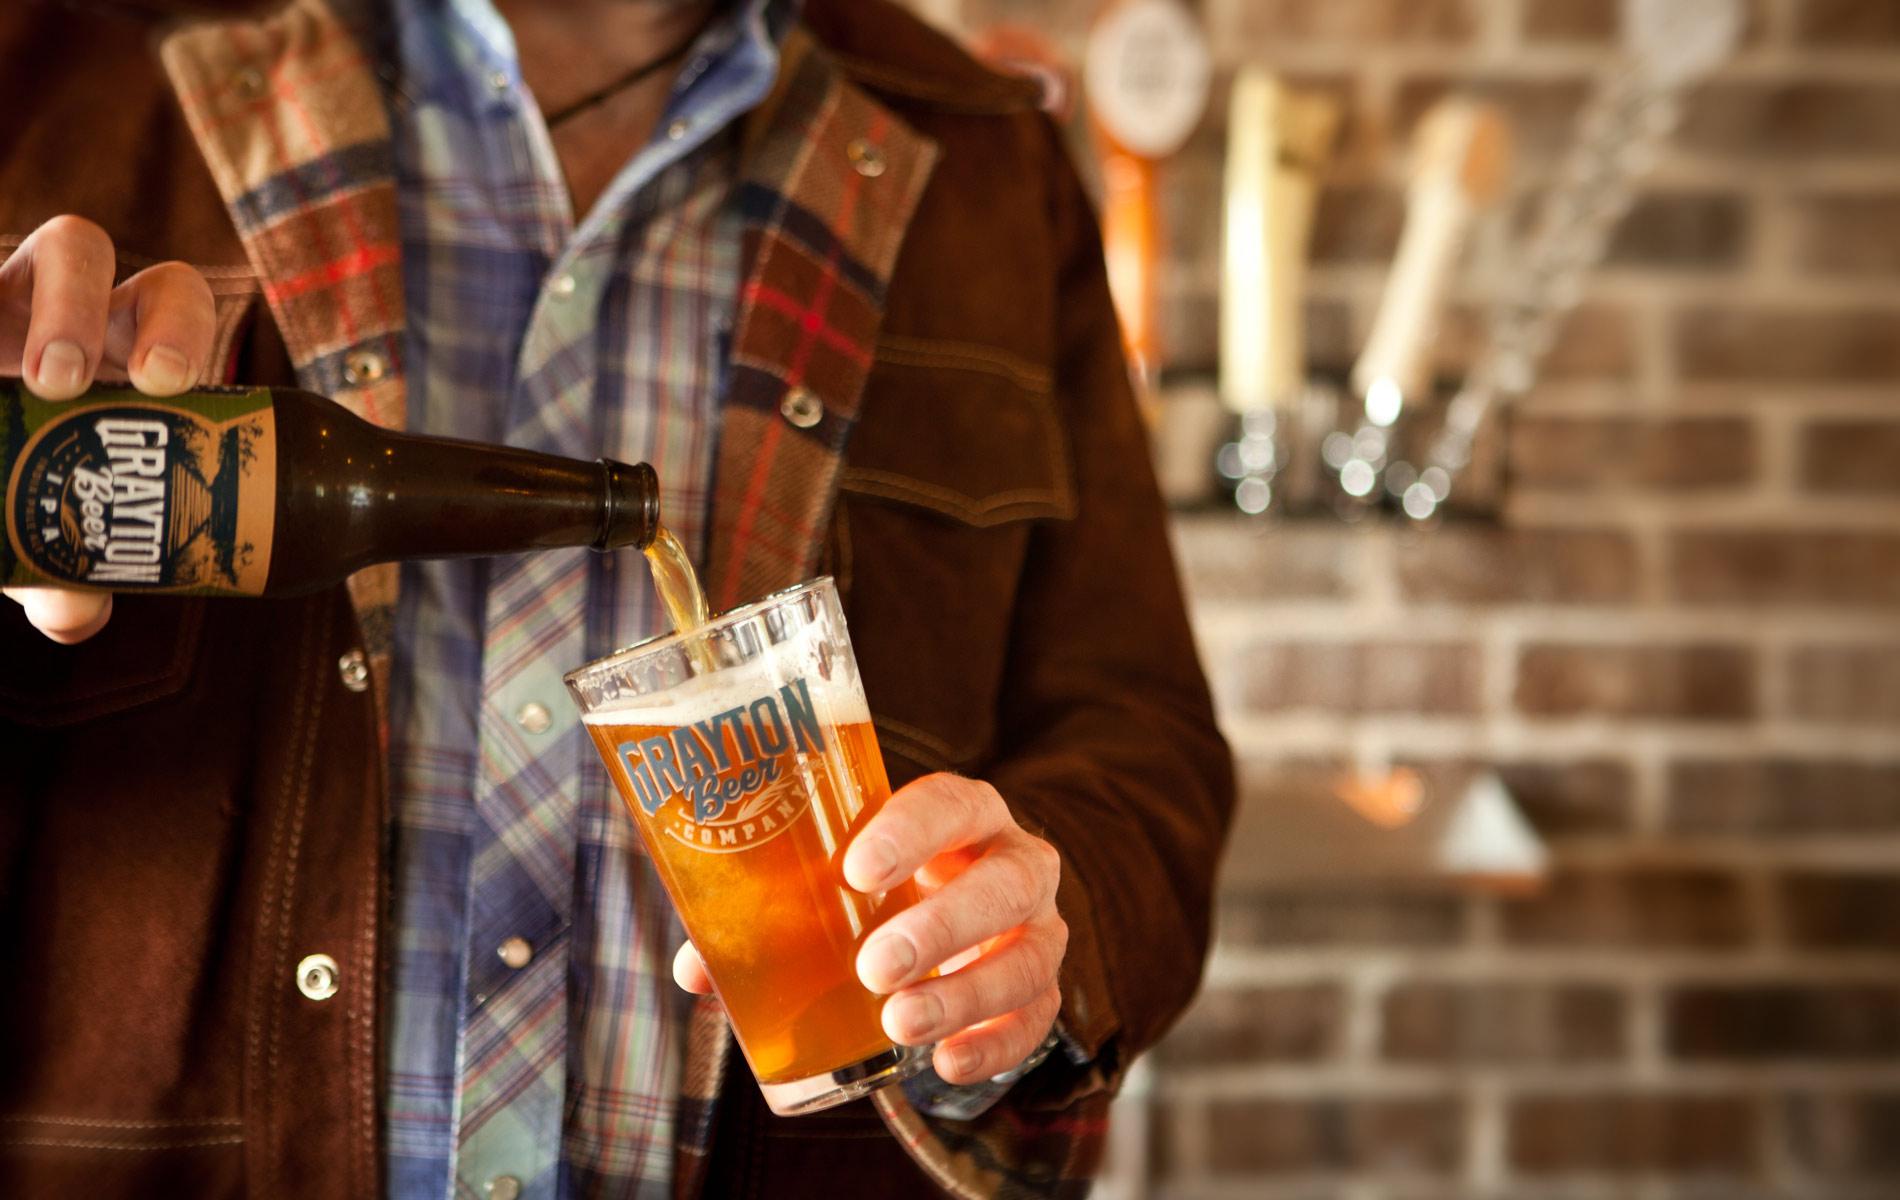 vie-magazine-grayton-beer